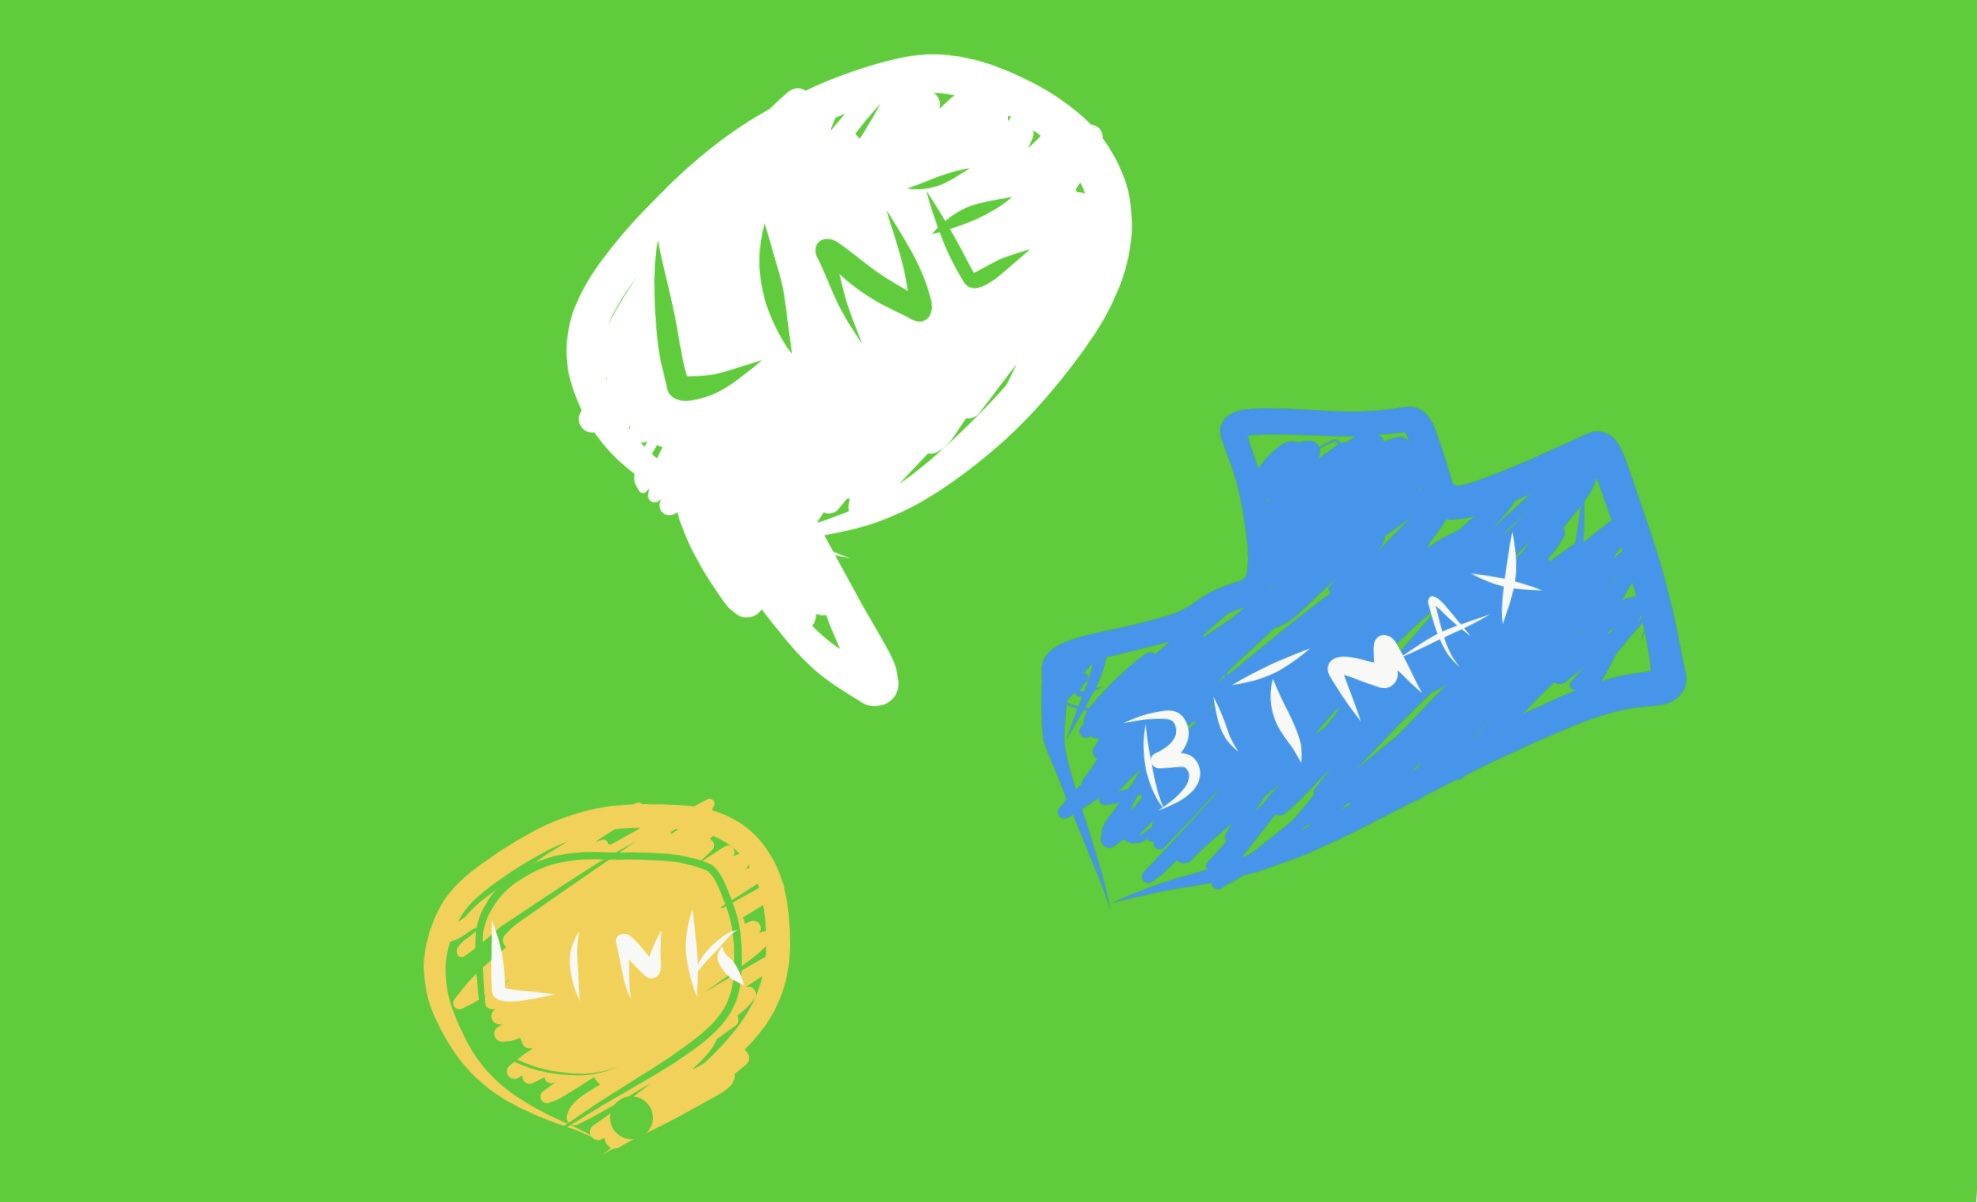 LINEが仮想通貨取引業者登録?独自通貨「LINK」取引所「BITMAX」数週間以内に始動?ライン/暗号資産最新情報2019年6月